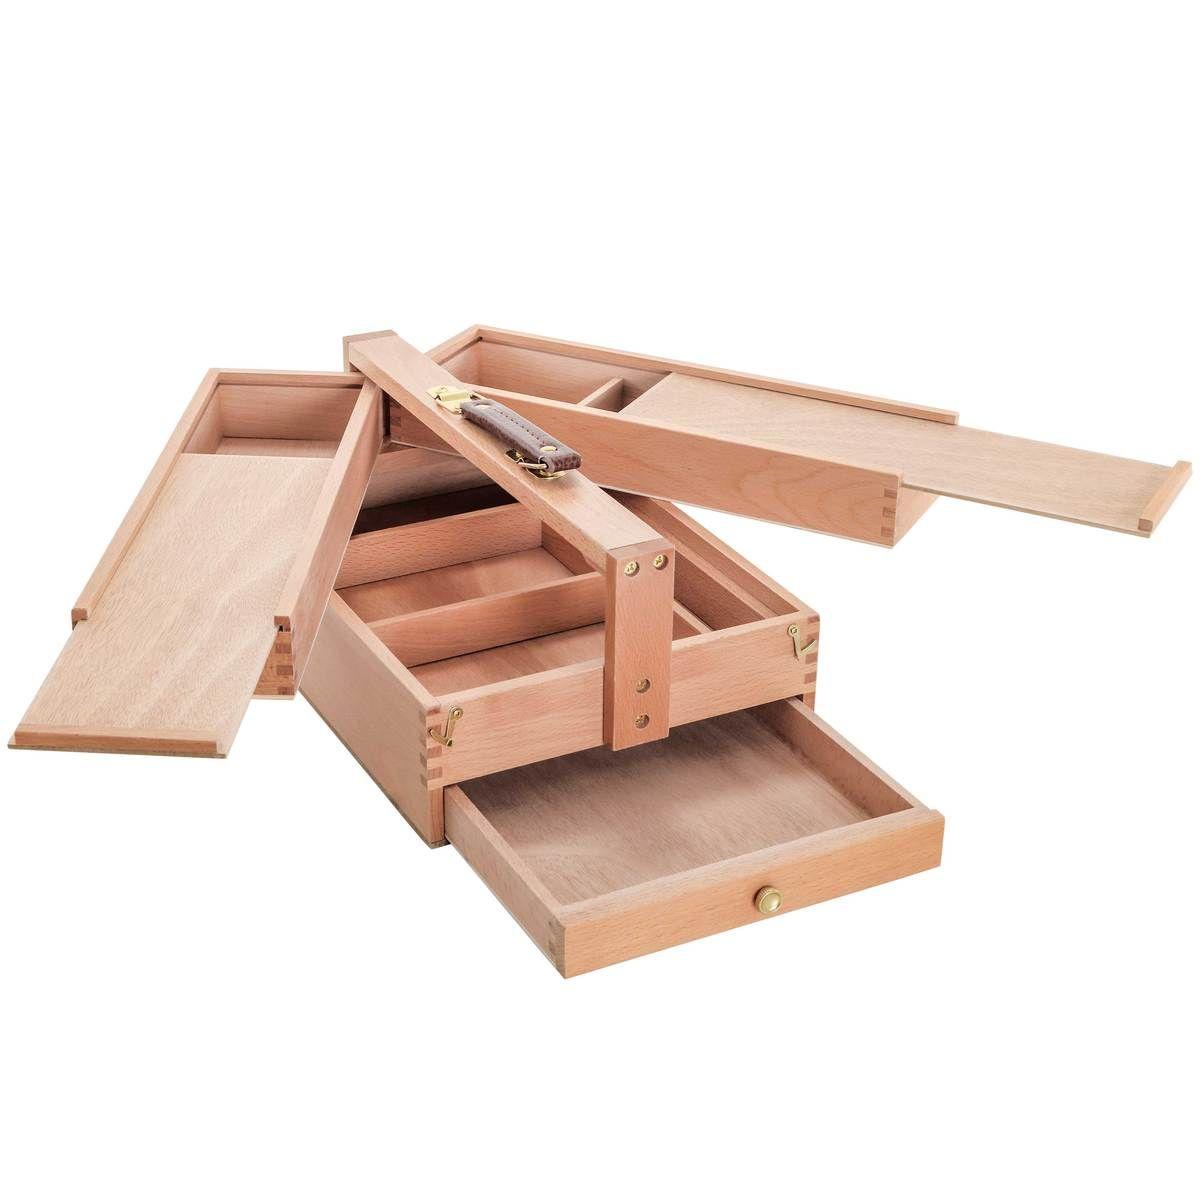 Large Multi Function Wooden Artist Tool Brush Storage Box In 2020 Wood Storage Box Sewing Organization Storage Boxes